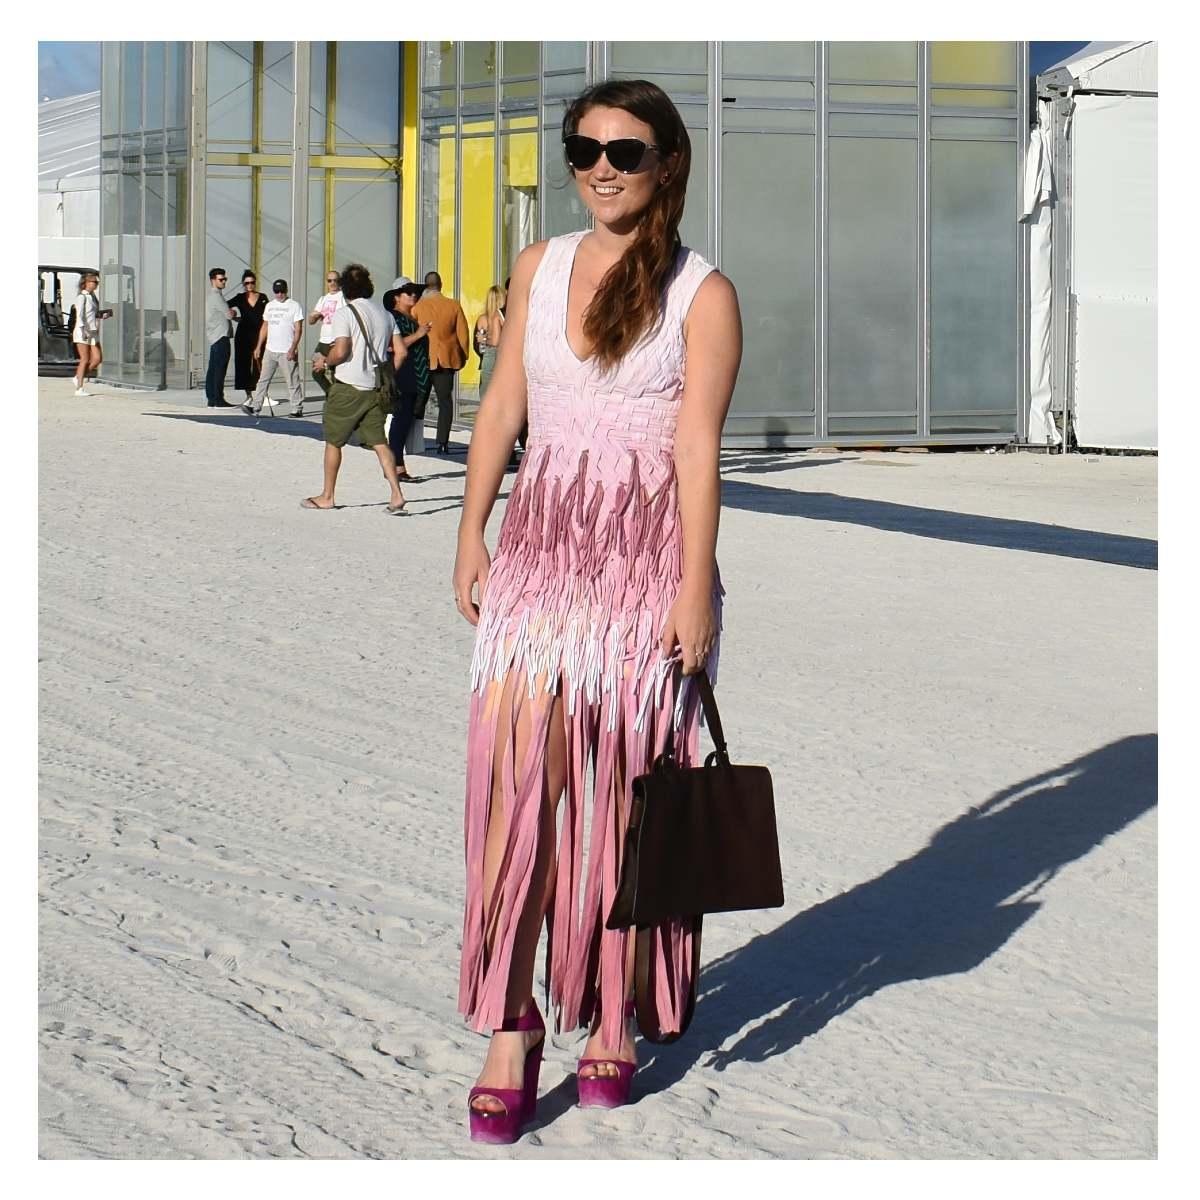 xoxo Noelle Lynne - Founder of Florum Fashion Magazine